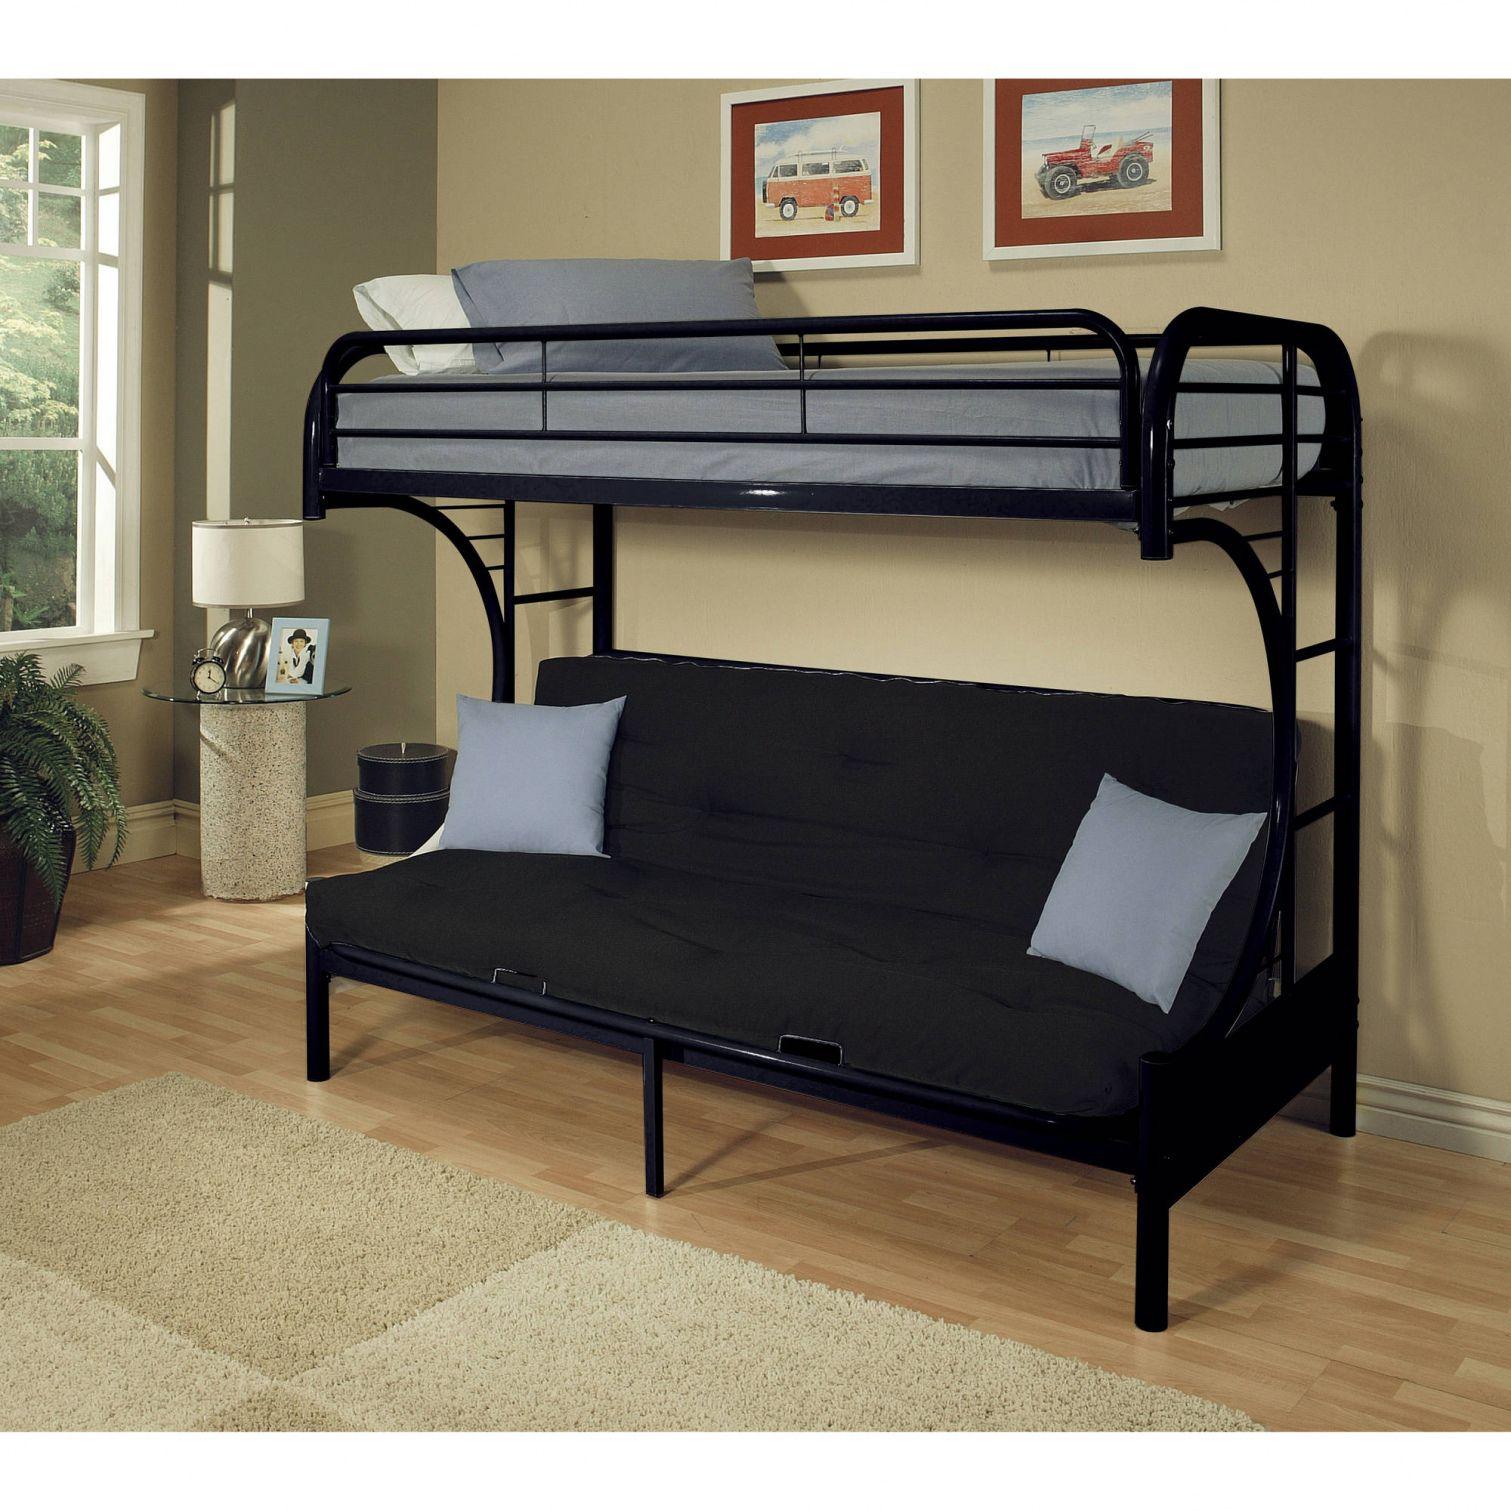 adult futon bunk bed   neutral interior paint colors check more at http    adult futon bunk bed   neutral interior paint colors check more at      rh   pinterest